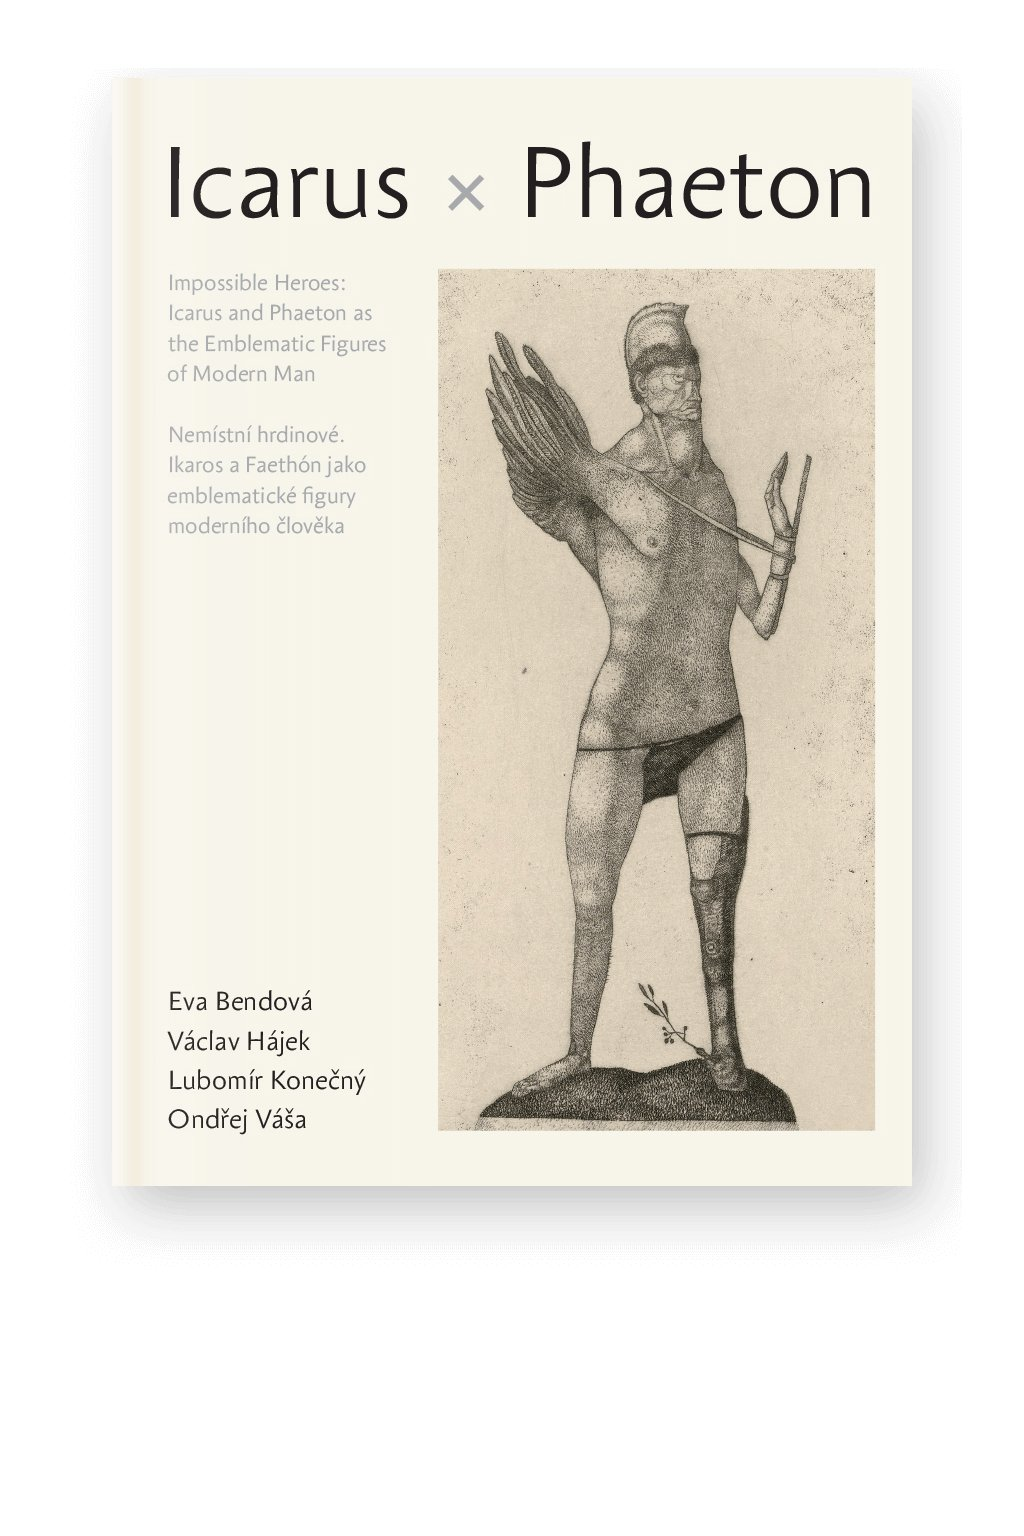 1424 nemistni hrdinove ikaros a faeton jako emblematicke figury moderniho cloveka